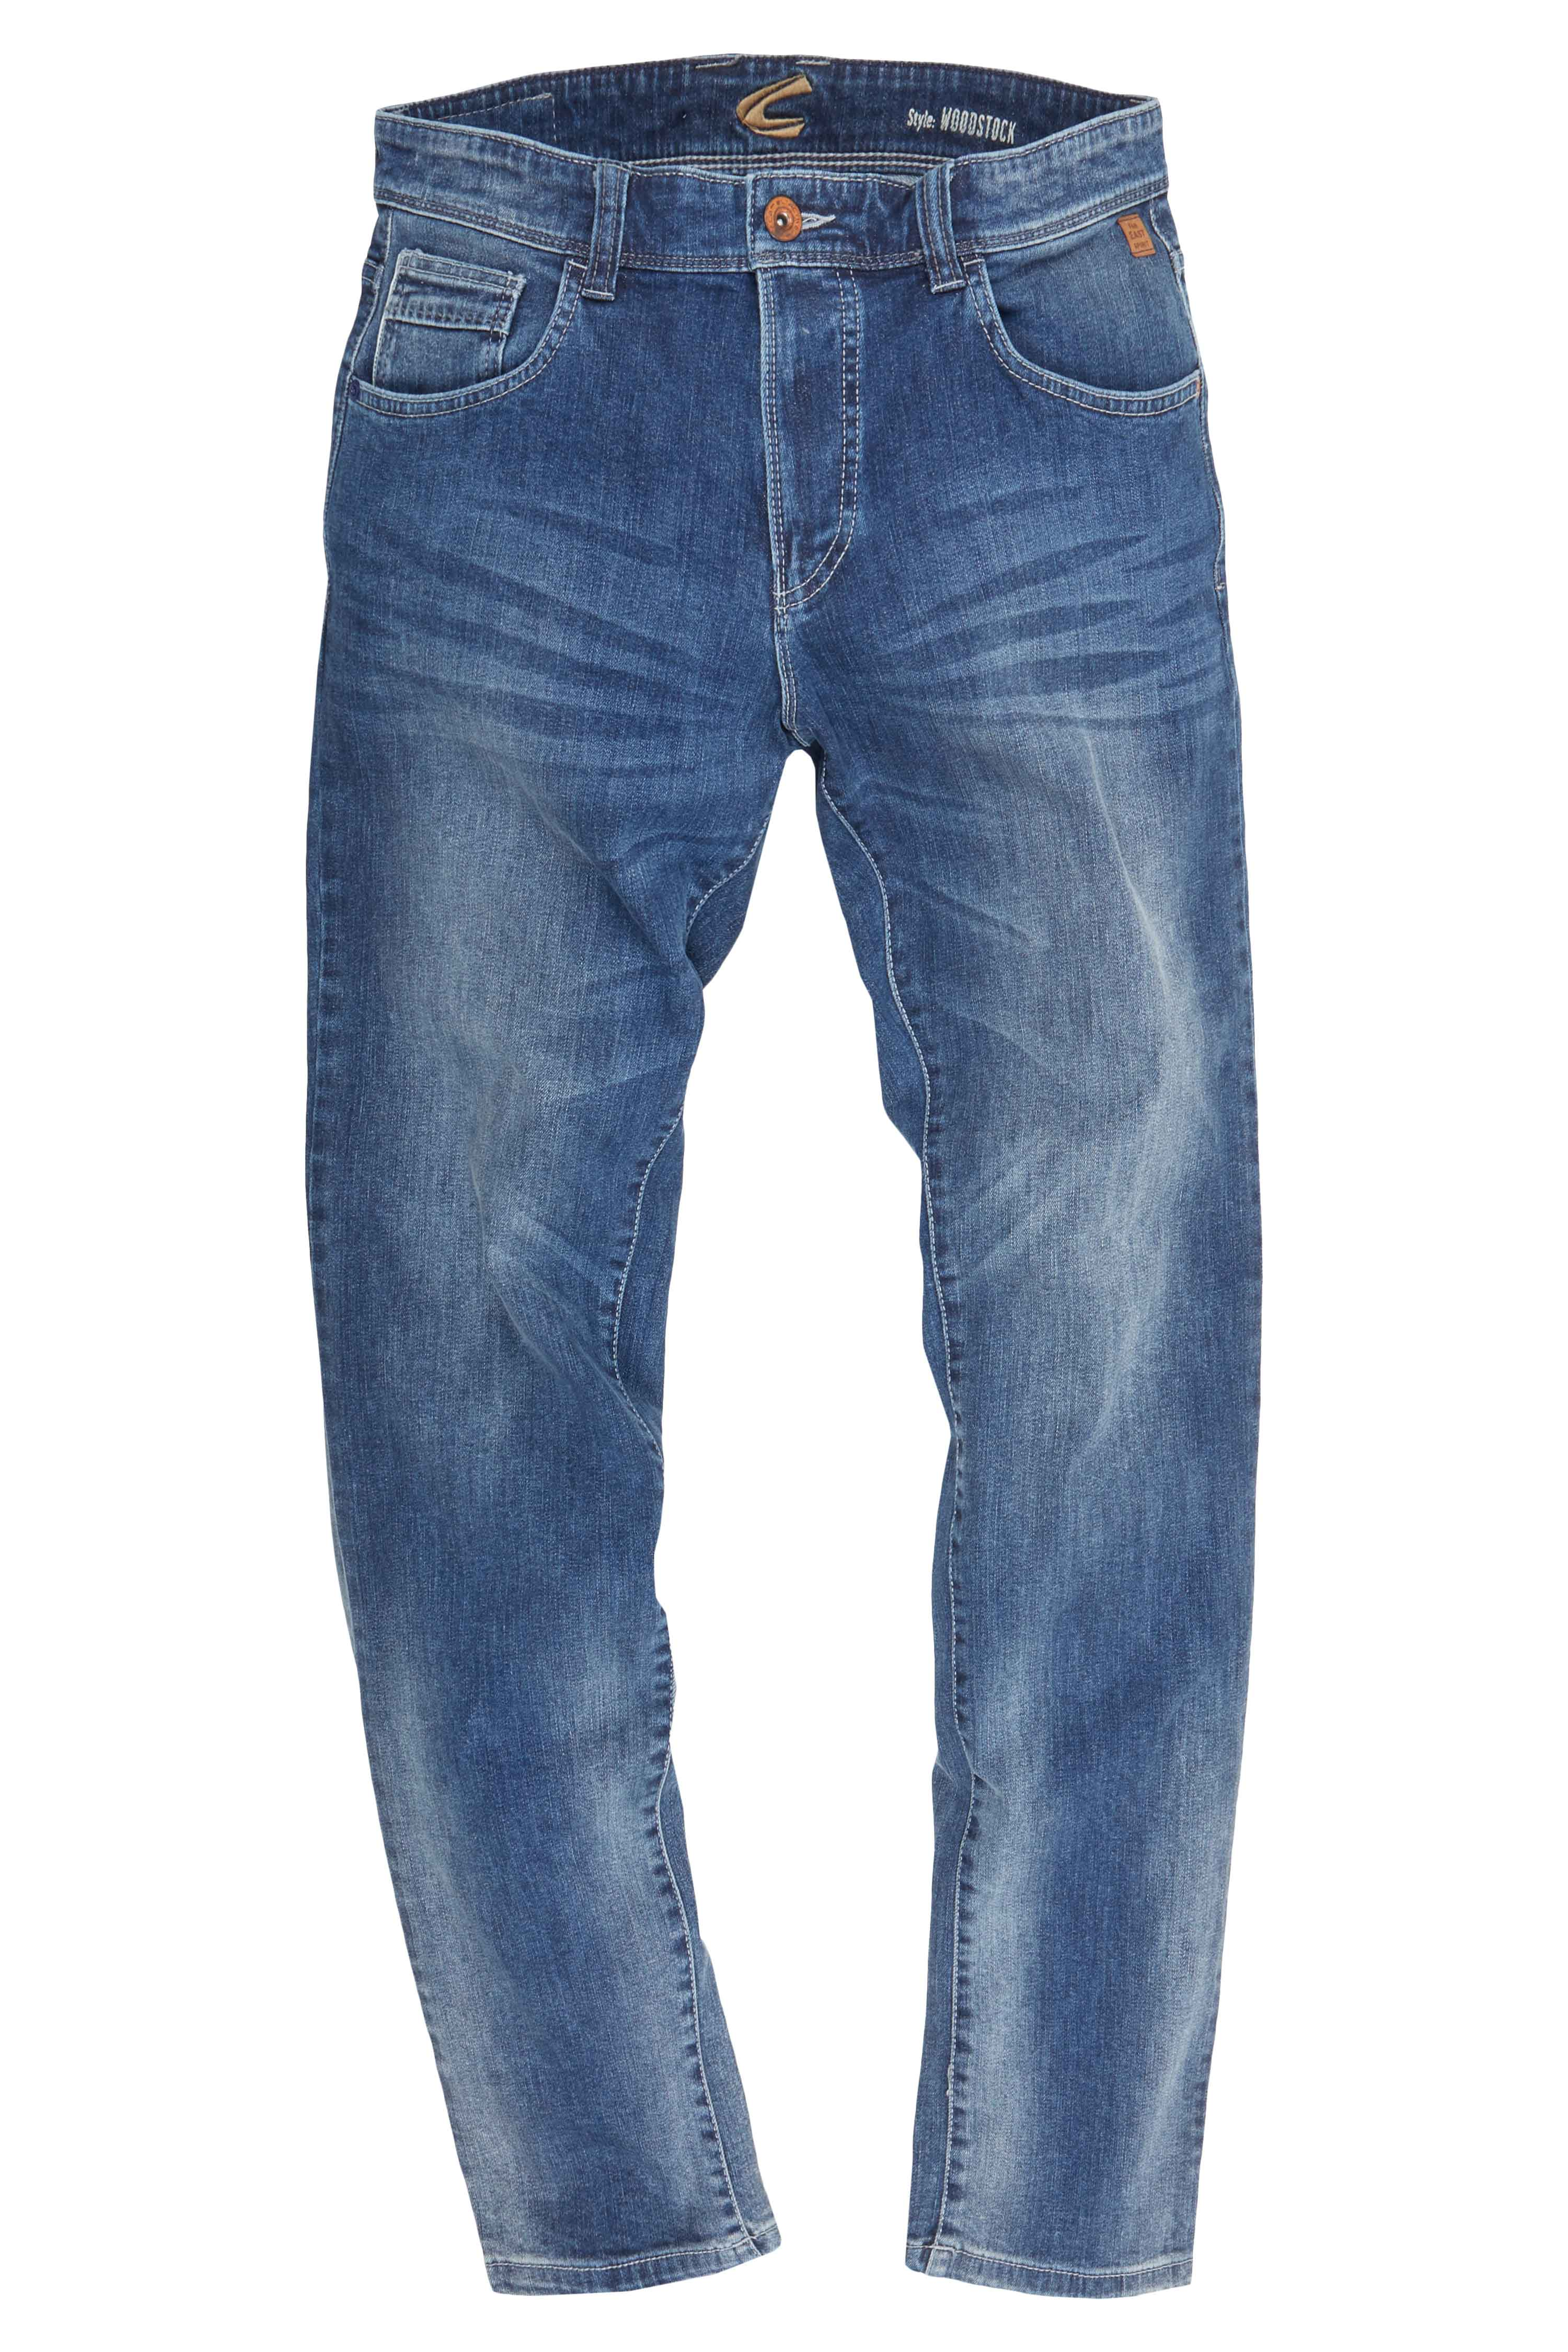 Camel Active Herren Jeans 5 Pocket Houston (9887 488405)